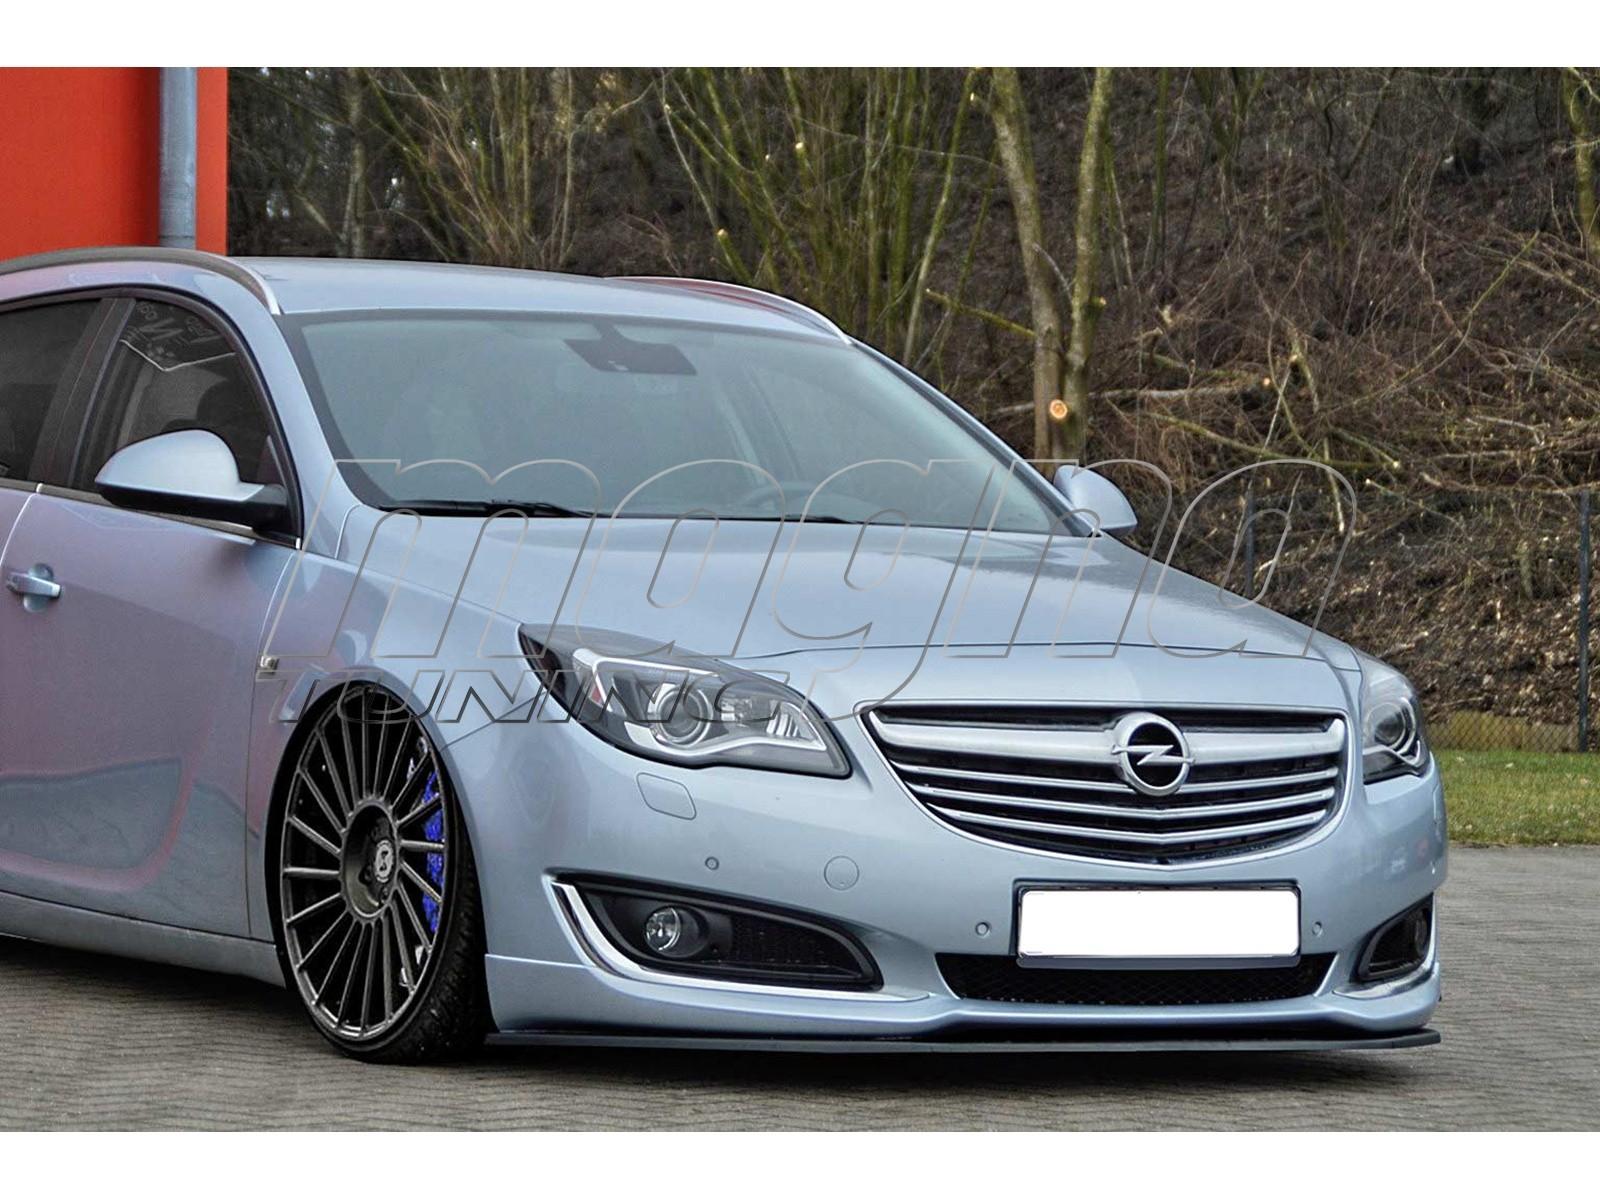 Opel Insignia A Isota Front Bumper Extension